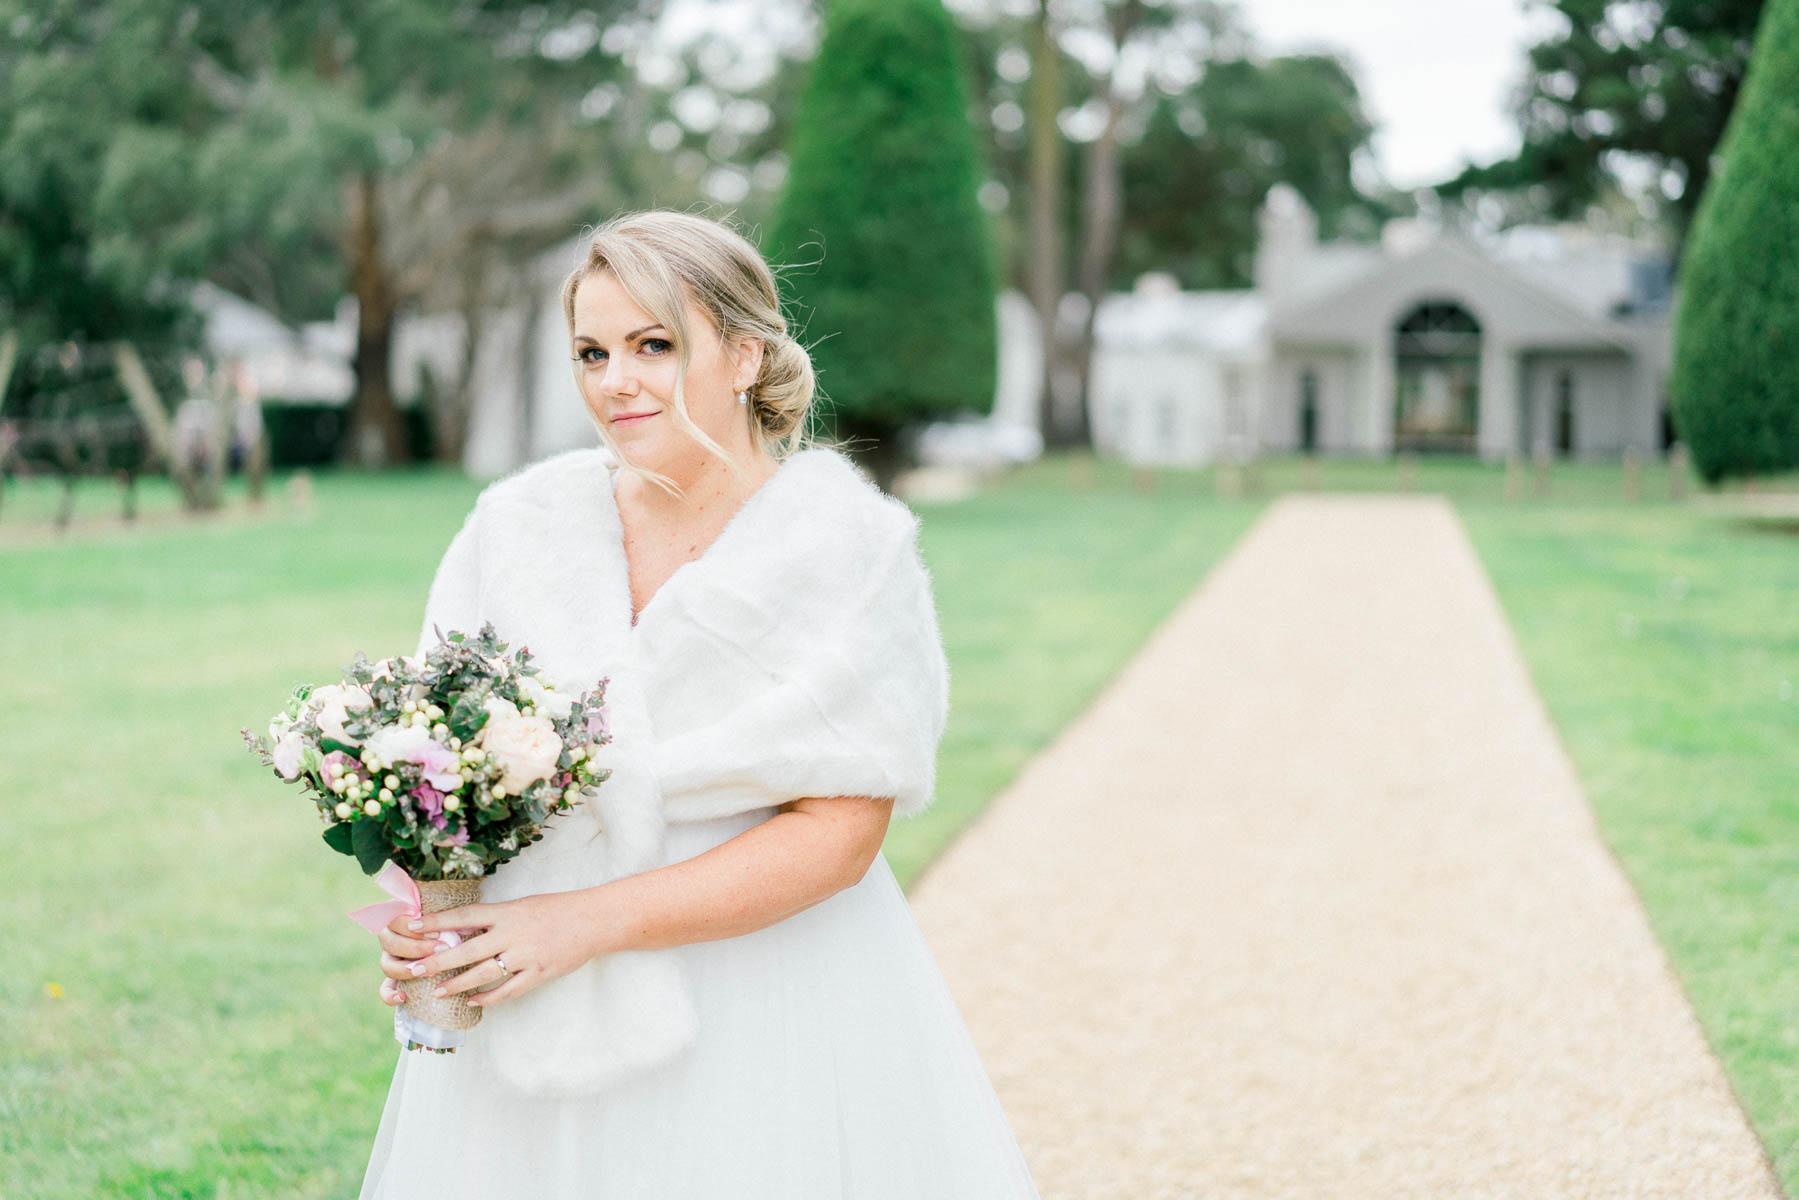 lindenderry-wedding-heart+soul-weddings-amy-alain-03686.jpg